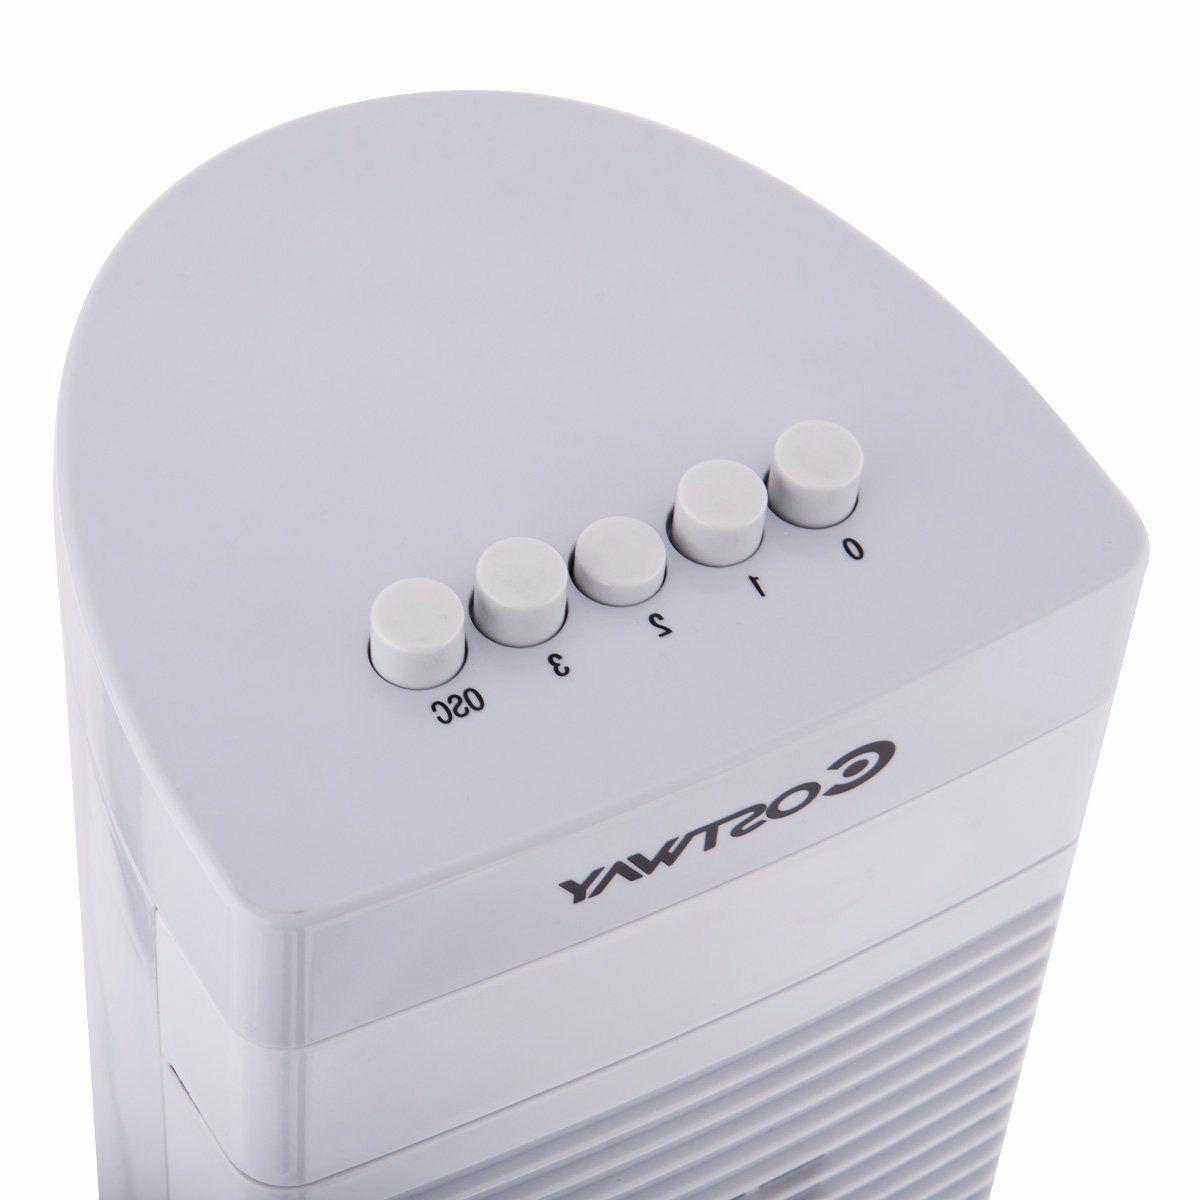 3-Speed Bladeless Oscillating Fan Air Conditioner Portable Floor